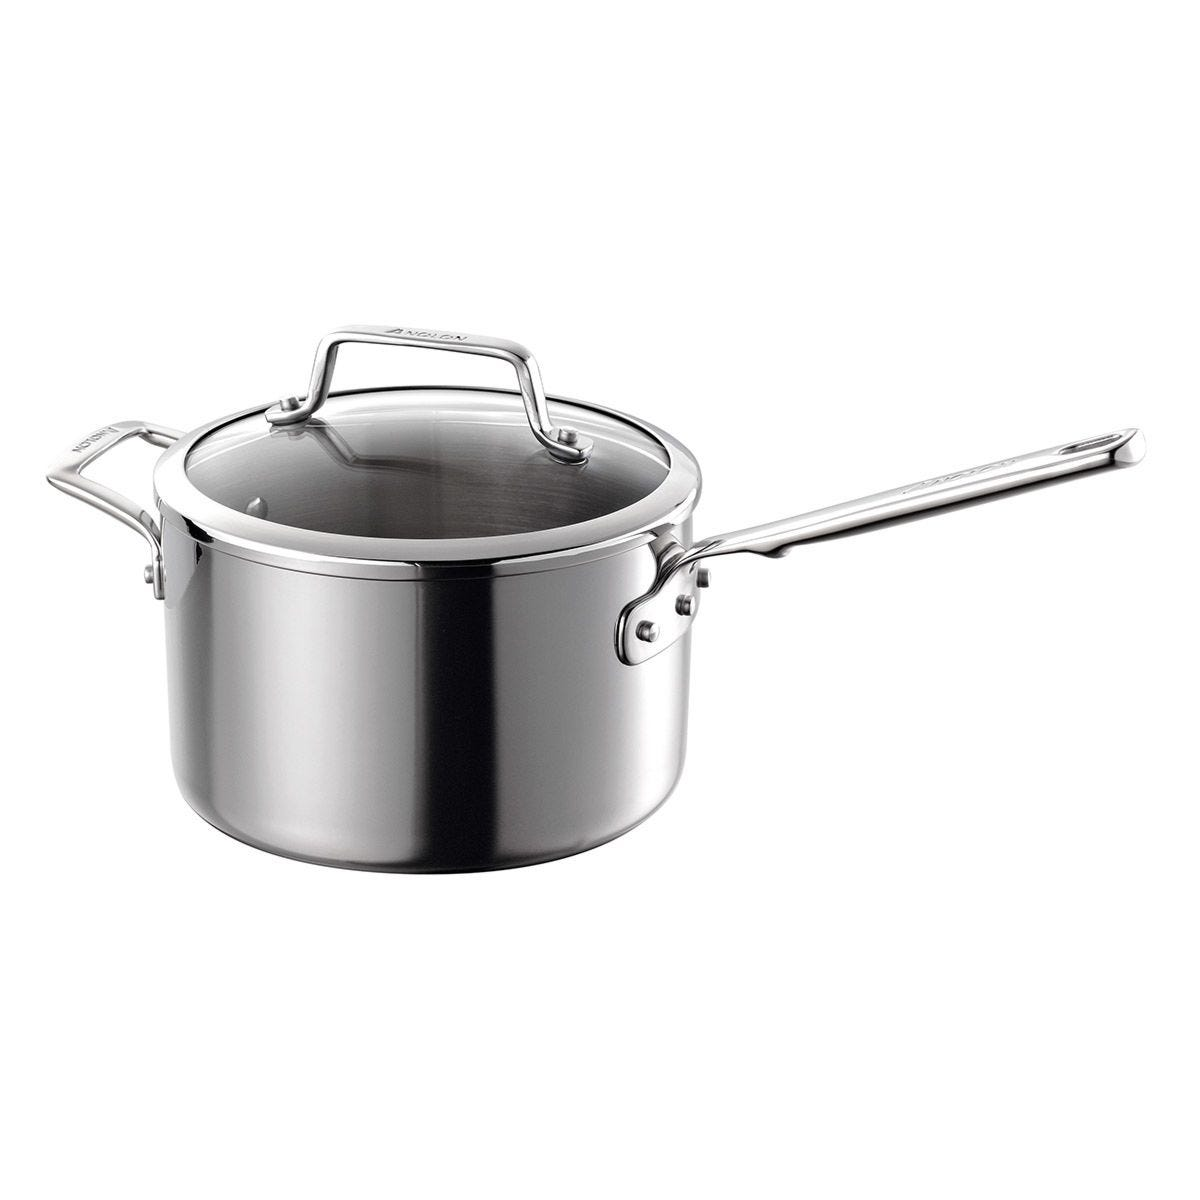 Anolon Tri Ply 20cm Saucepan - Stainless Steel